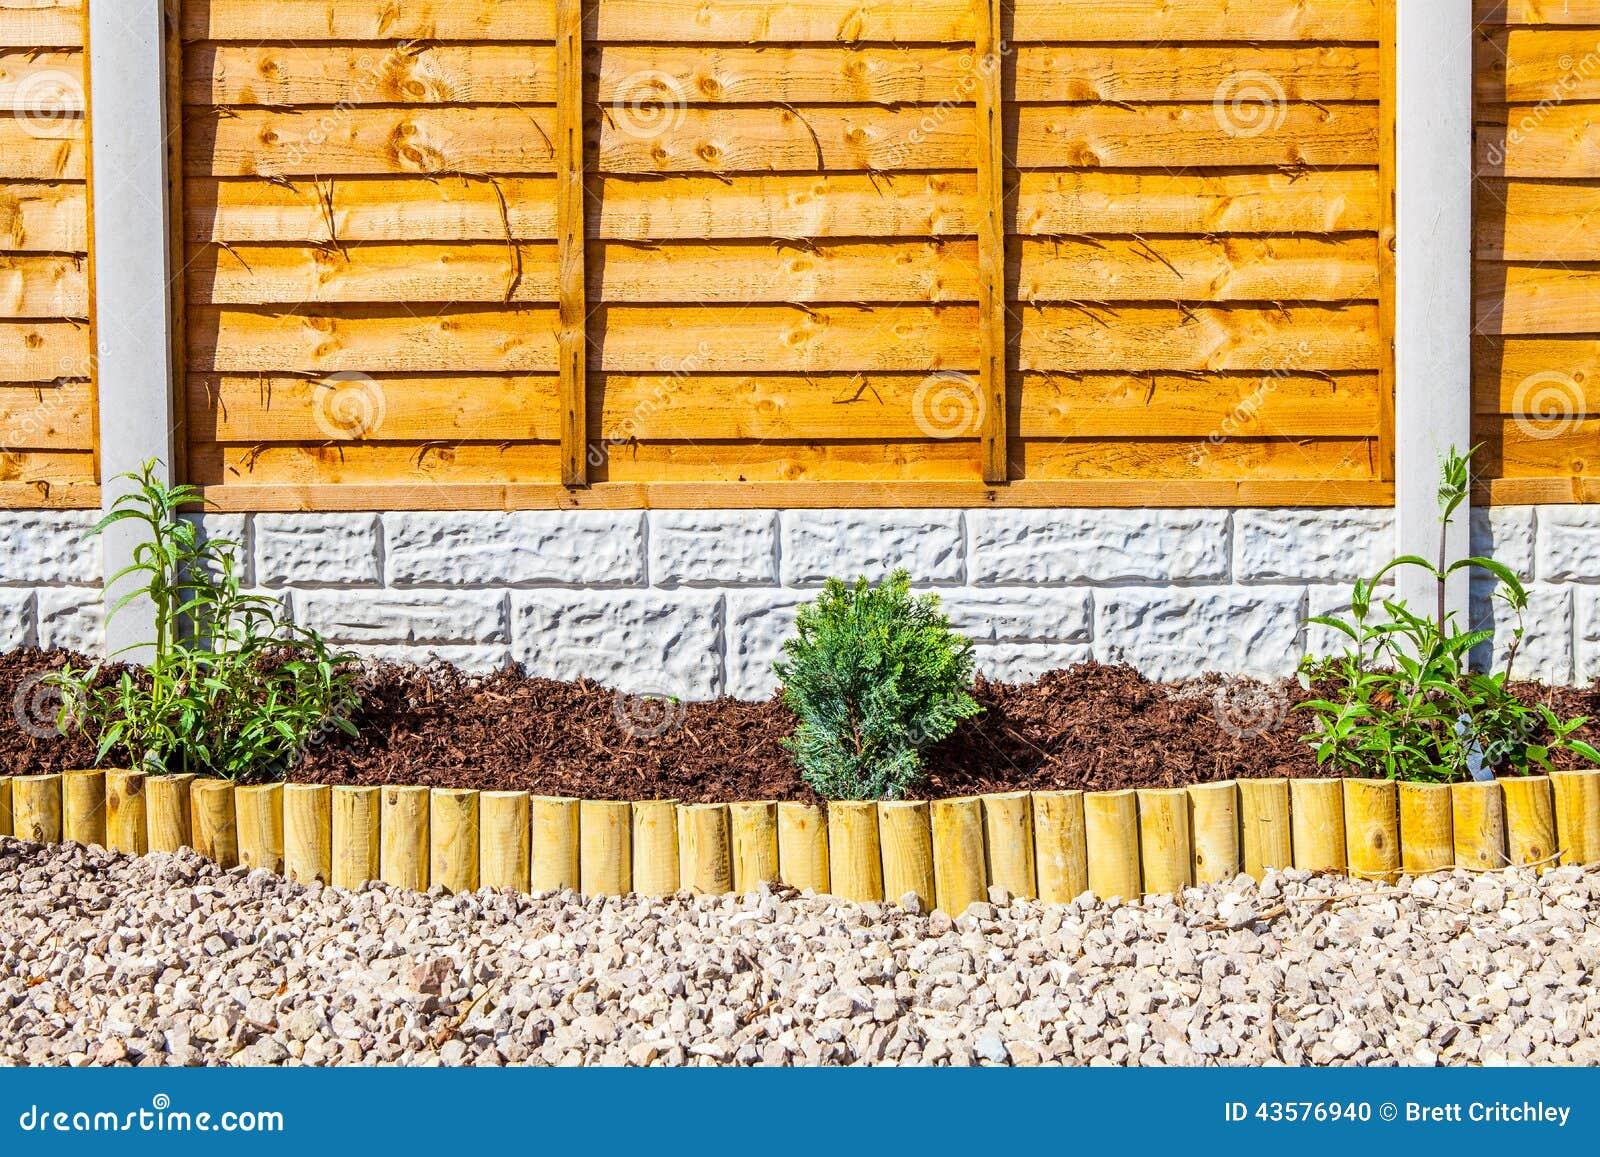 Garden border fence home design and decorating new landscaped wood chip garden border stock photo image garden idea baanklon Images